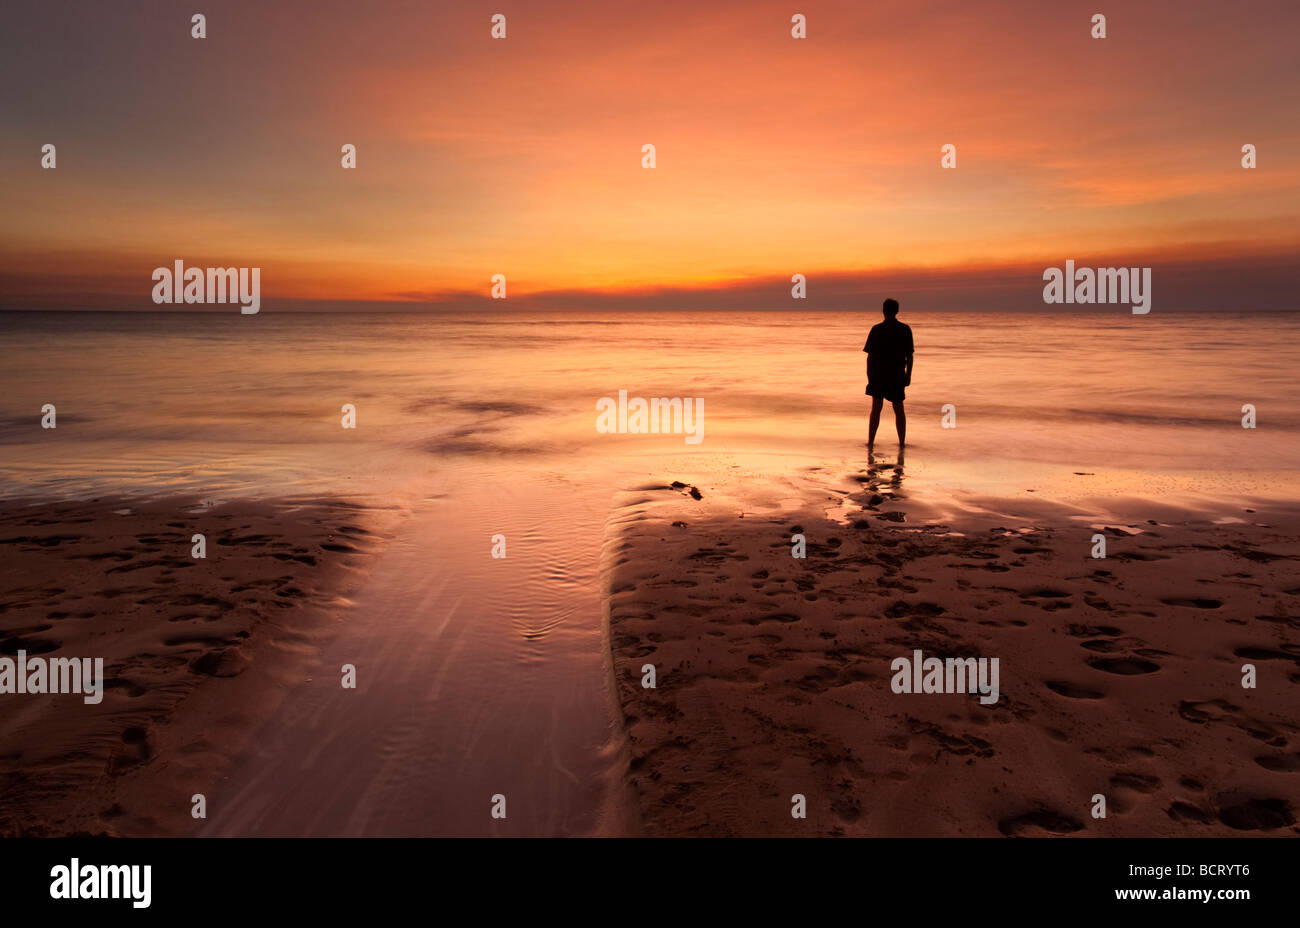 Silhouette of a man standing on the seashore watching the sunset. Dripstone Beach, Darwin, Northern Territory, Australia - Stock Image